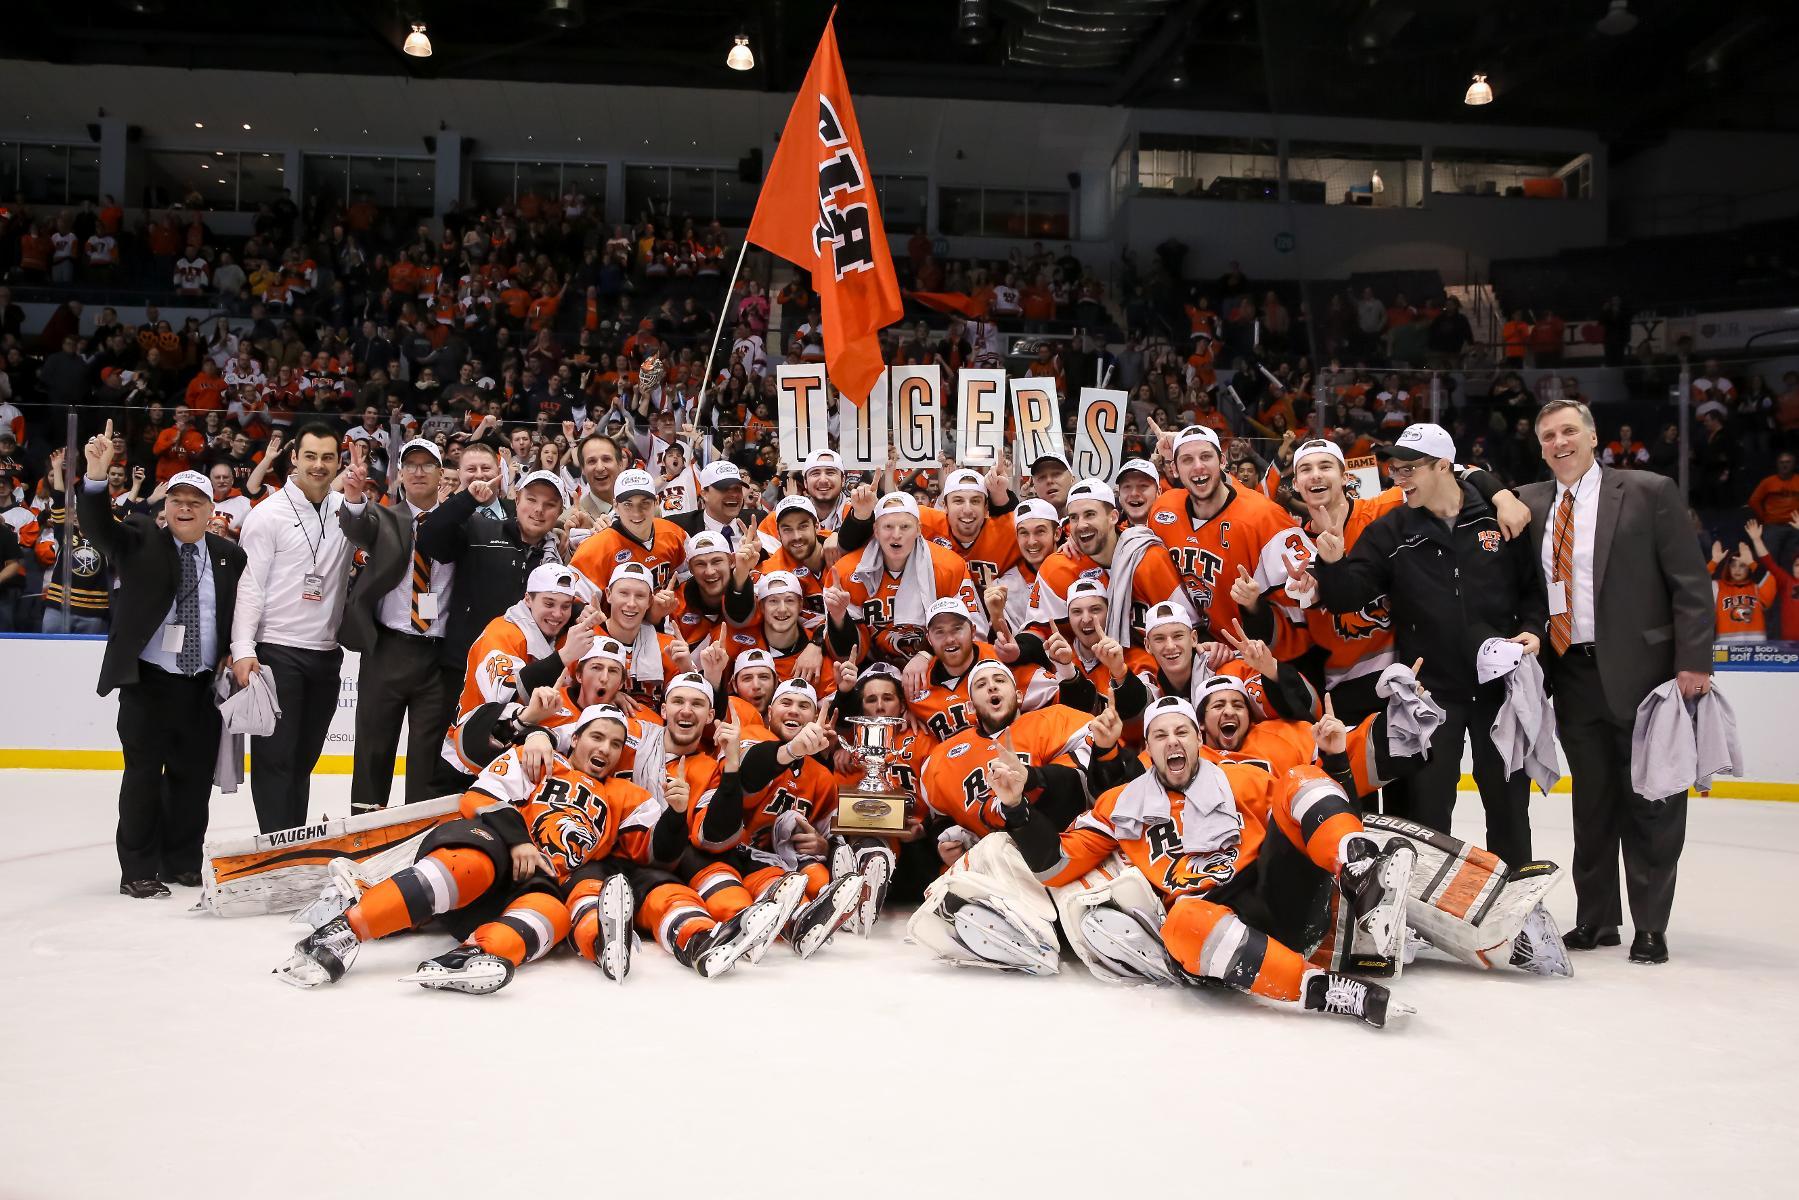 2015-16 Atlantic Hockey Season